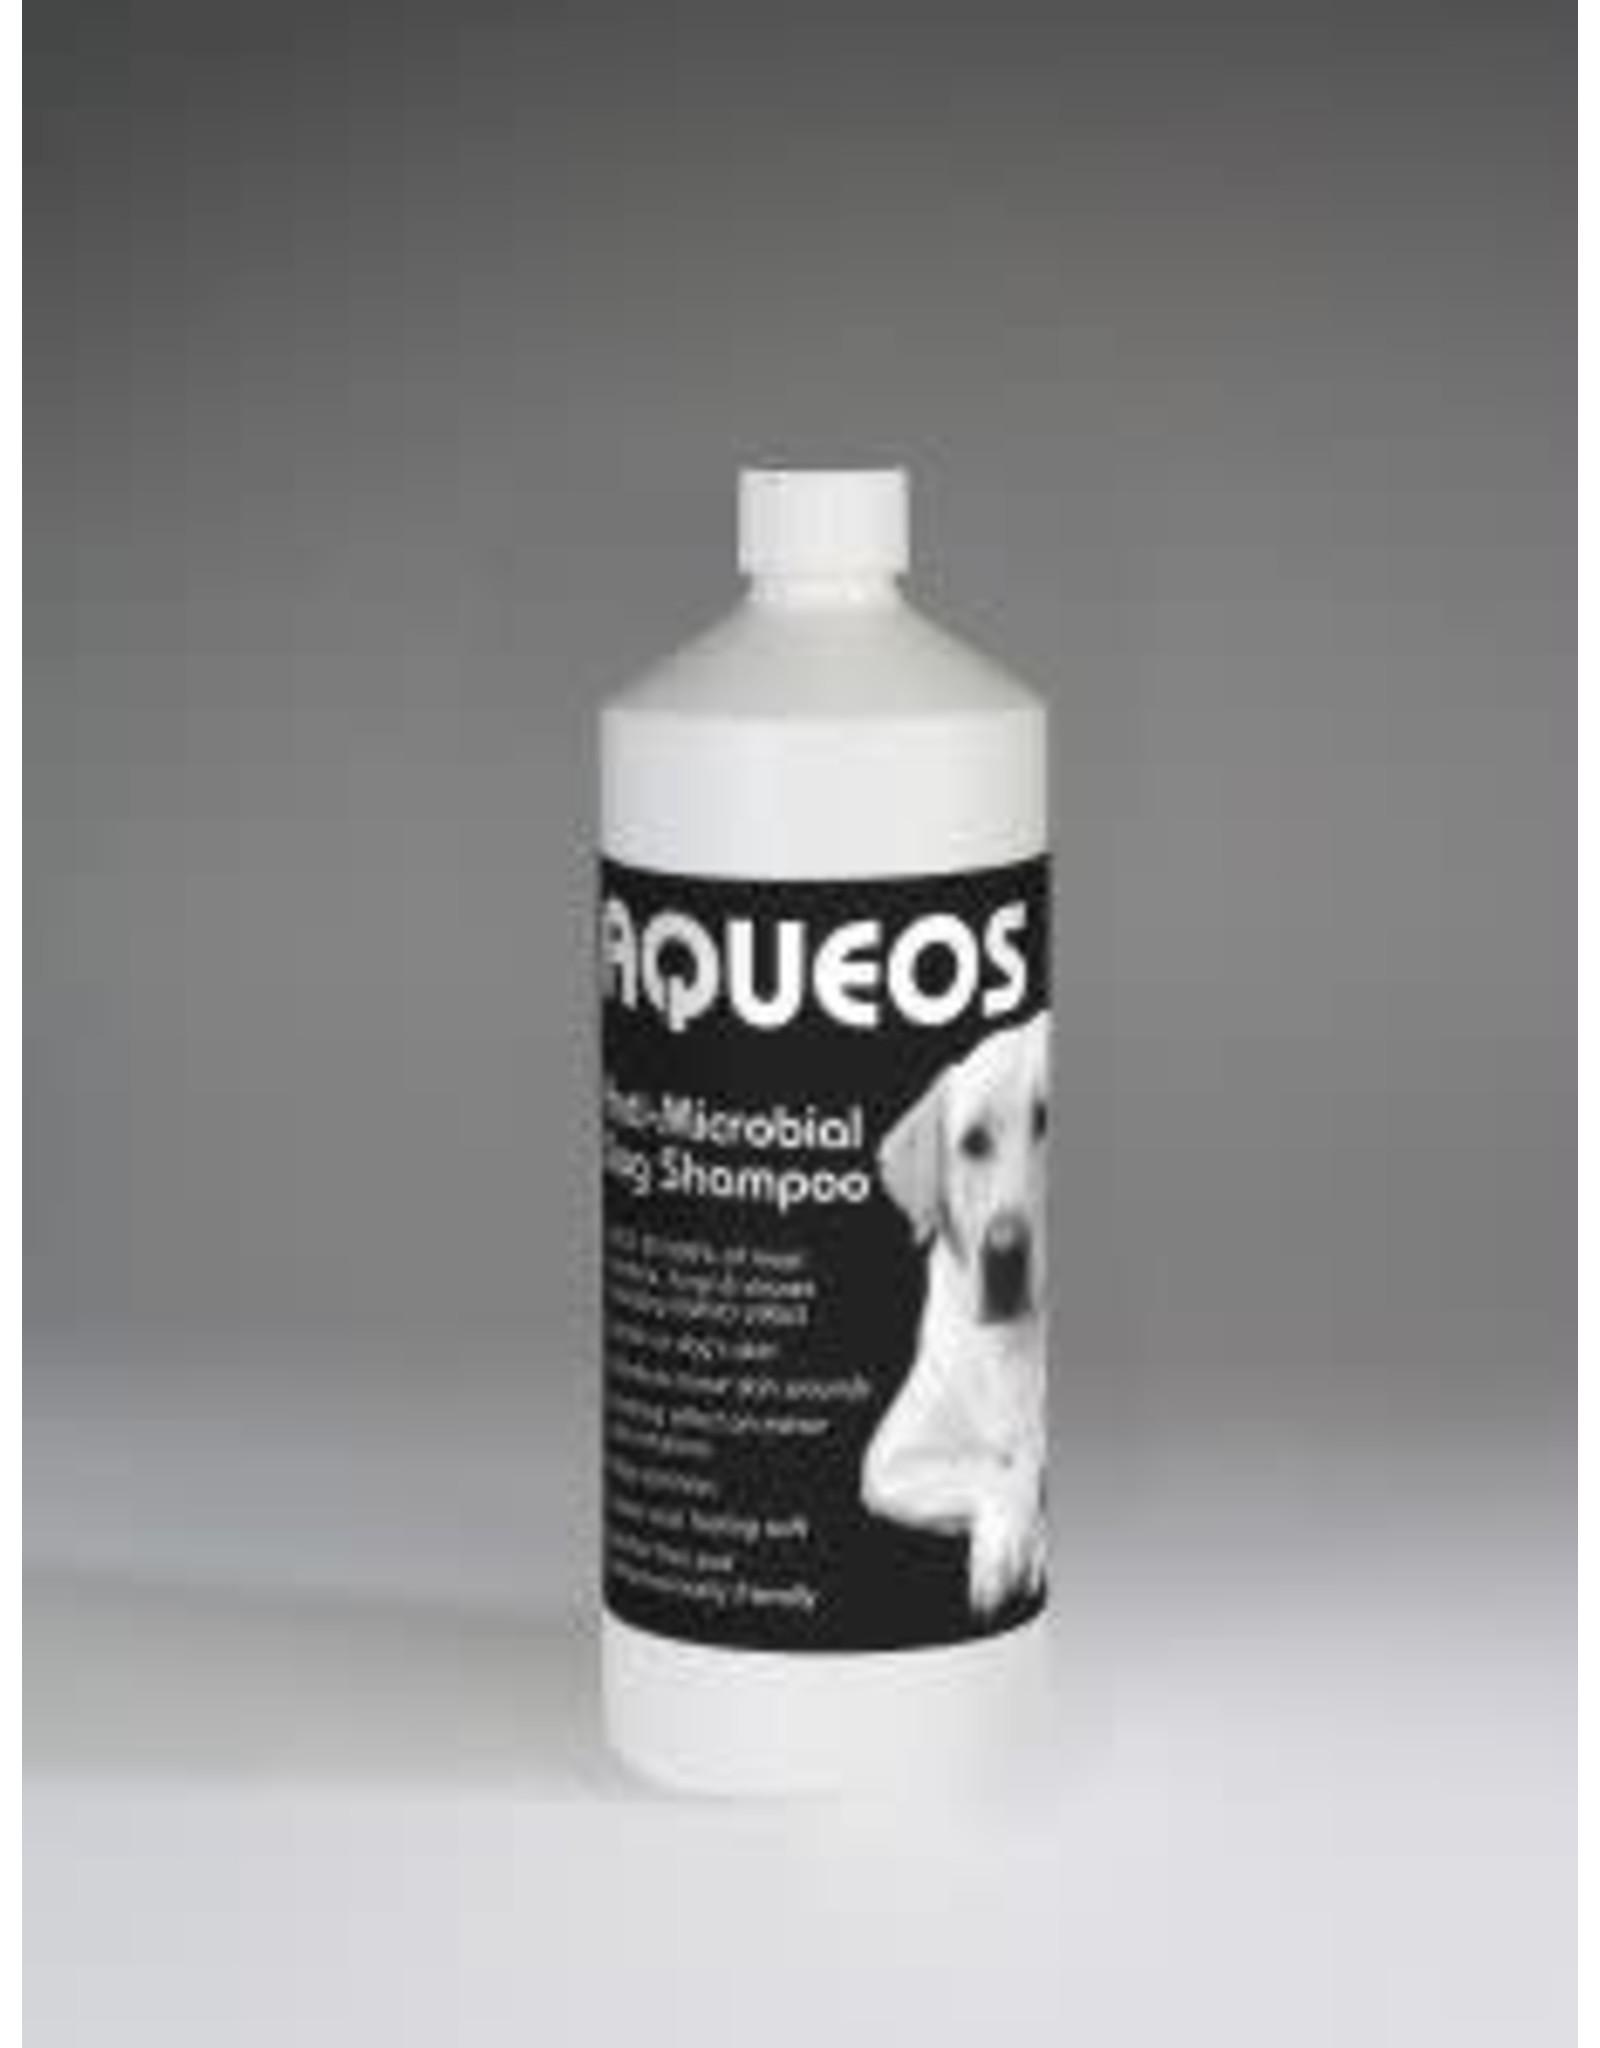 Aqueos Anti-Bacterial Dog Shampoo, 1ltr